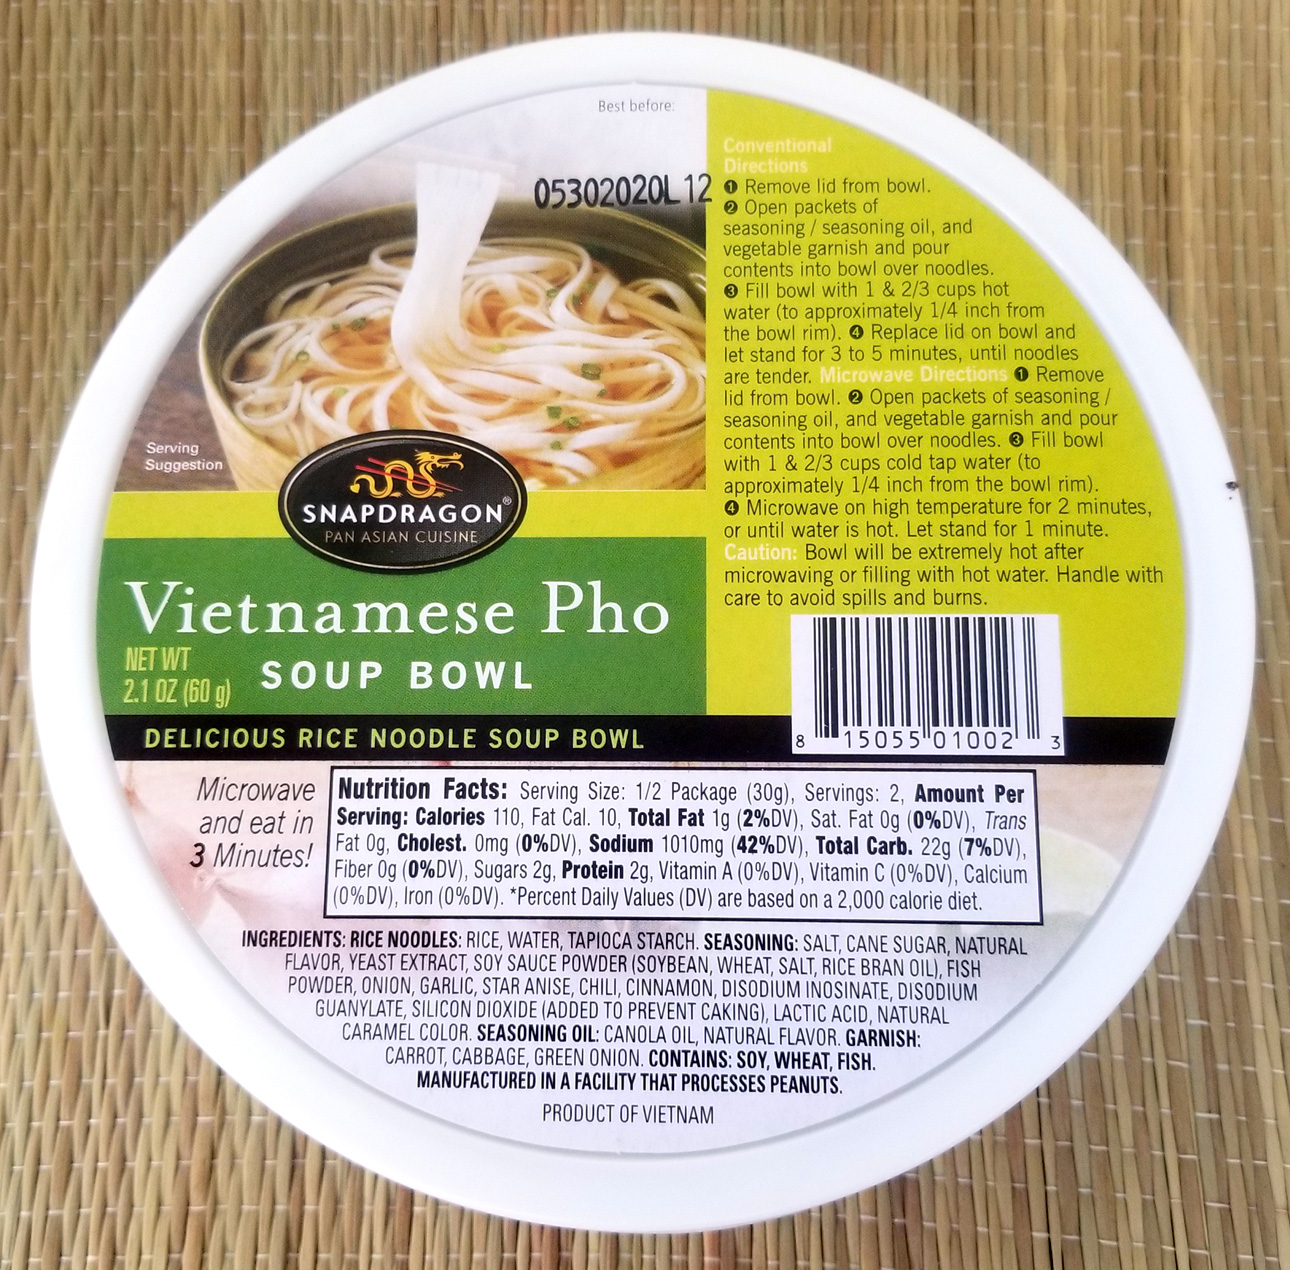 Costco Eats: Snapdragon Vietnamese Pho – Tasty Island